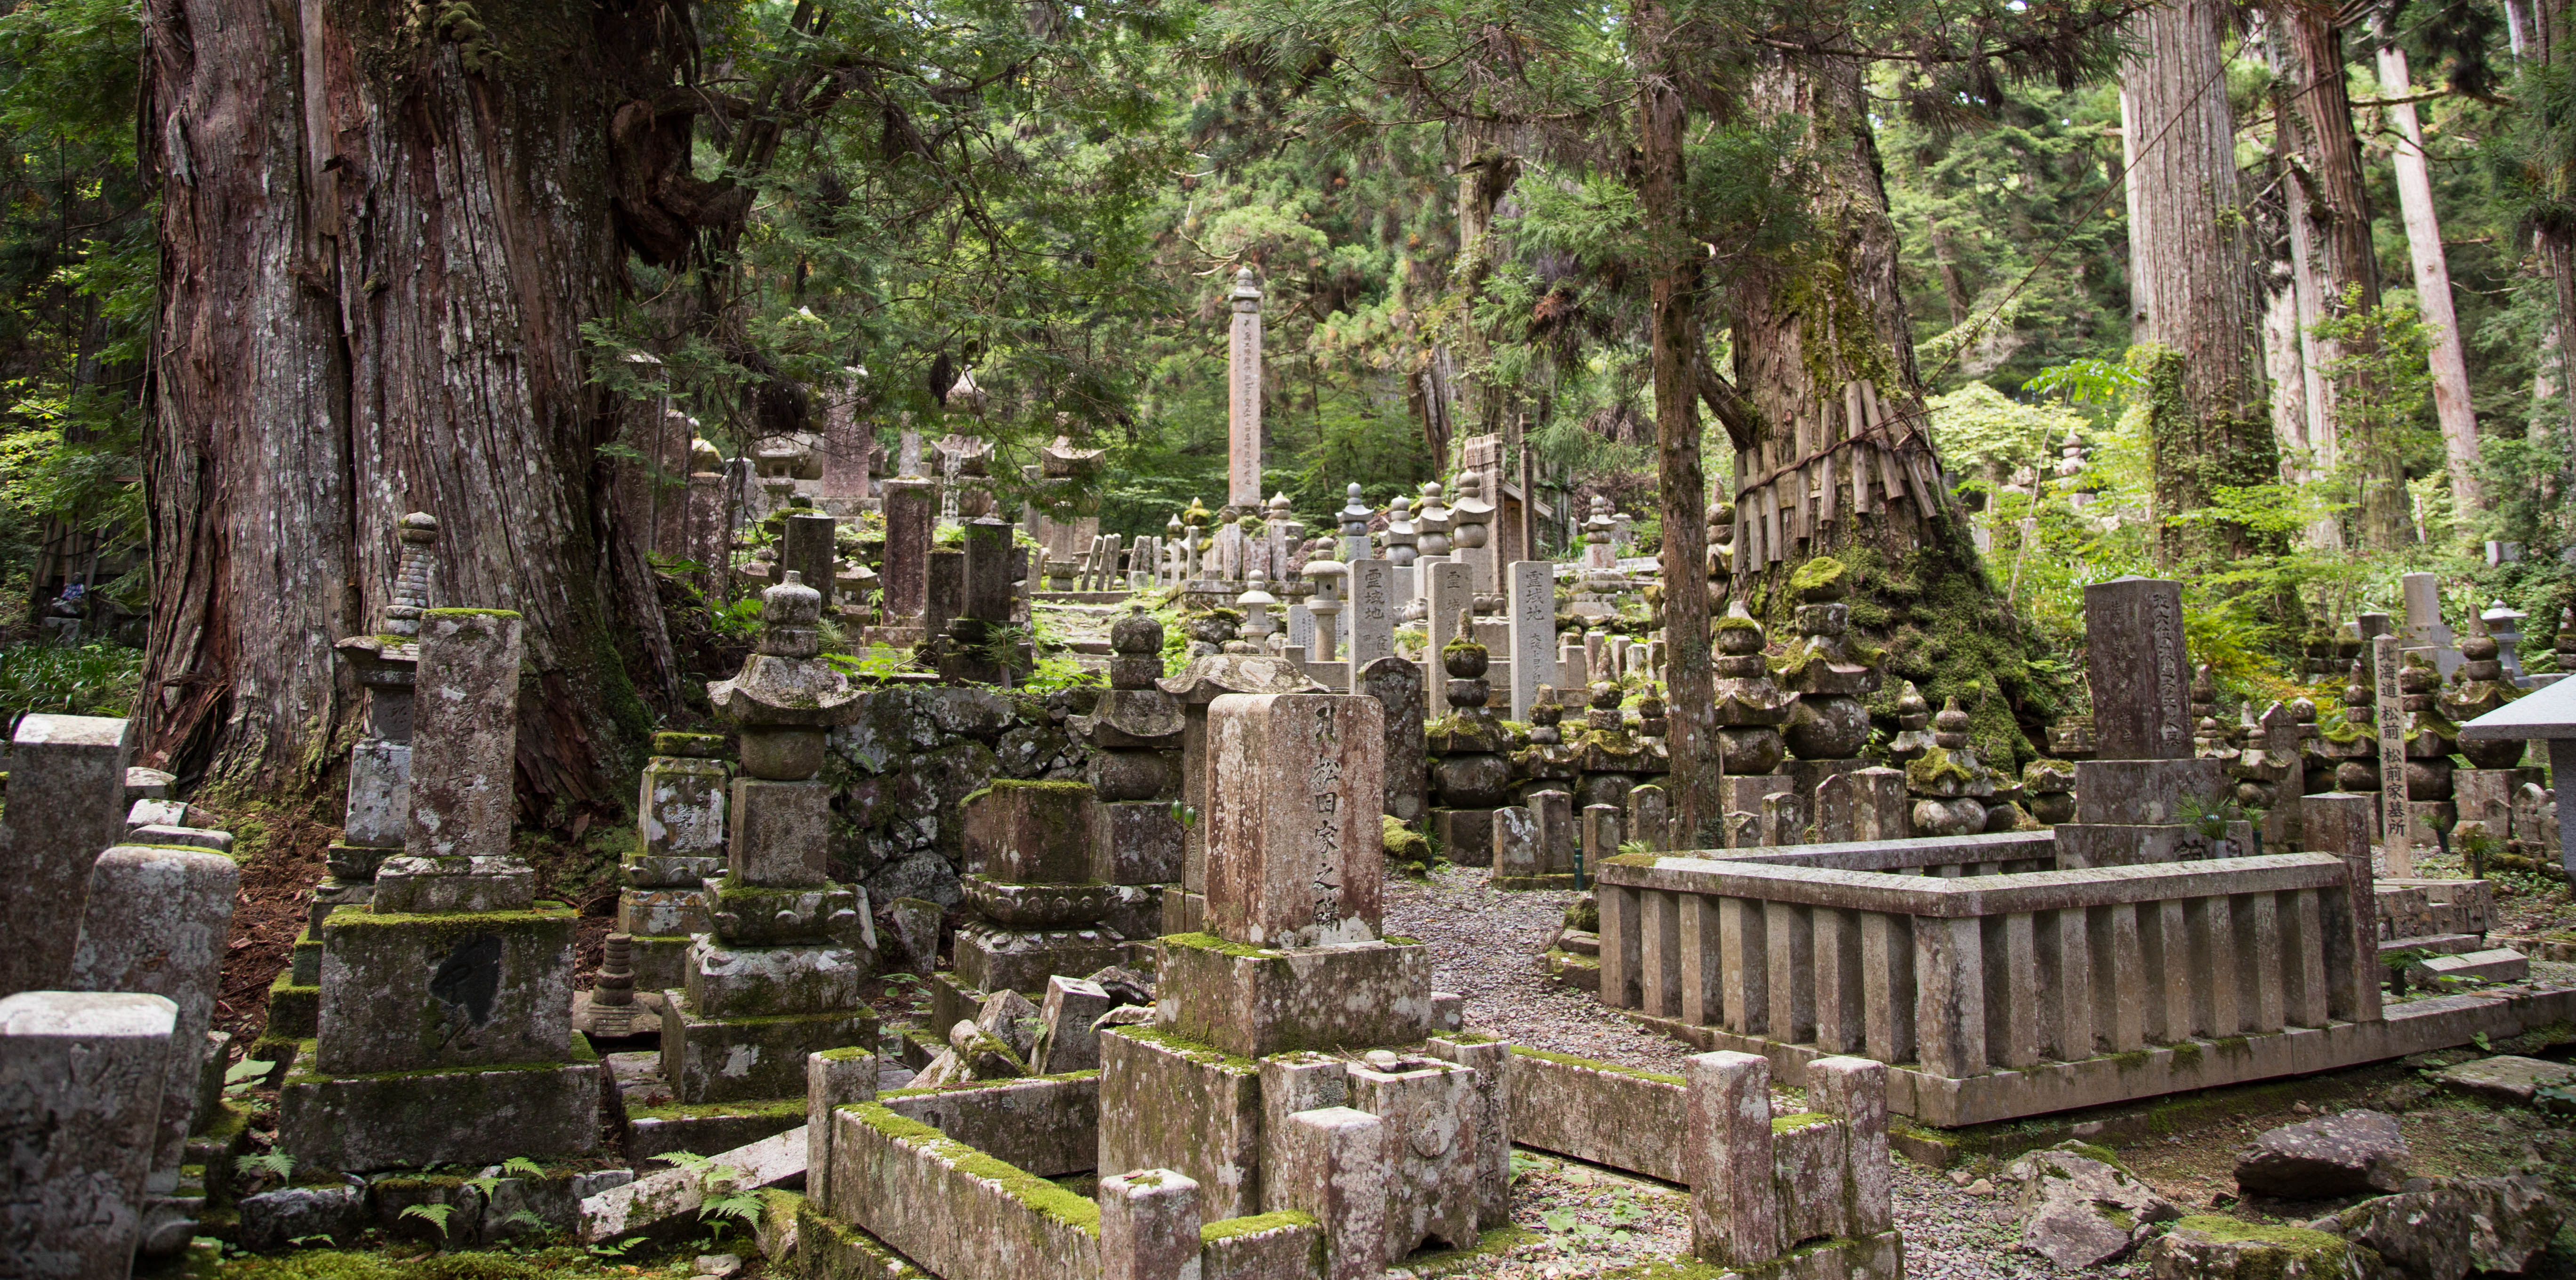 Mount Koya - Okunoin Temple